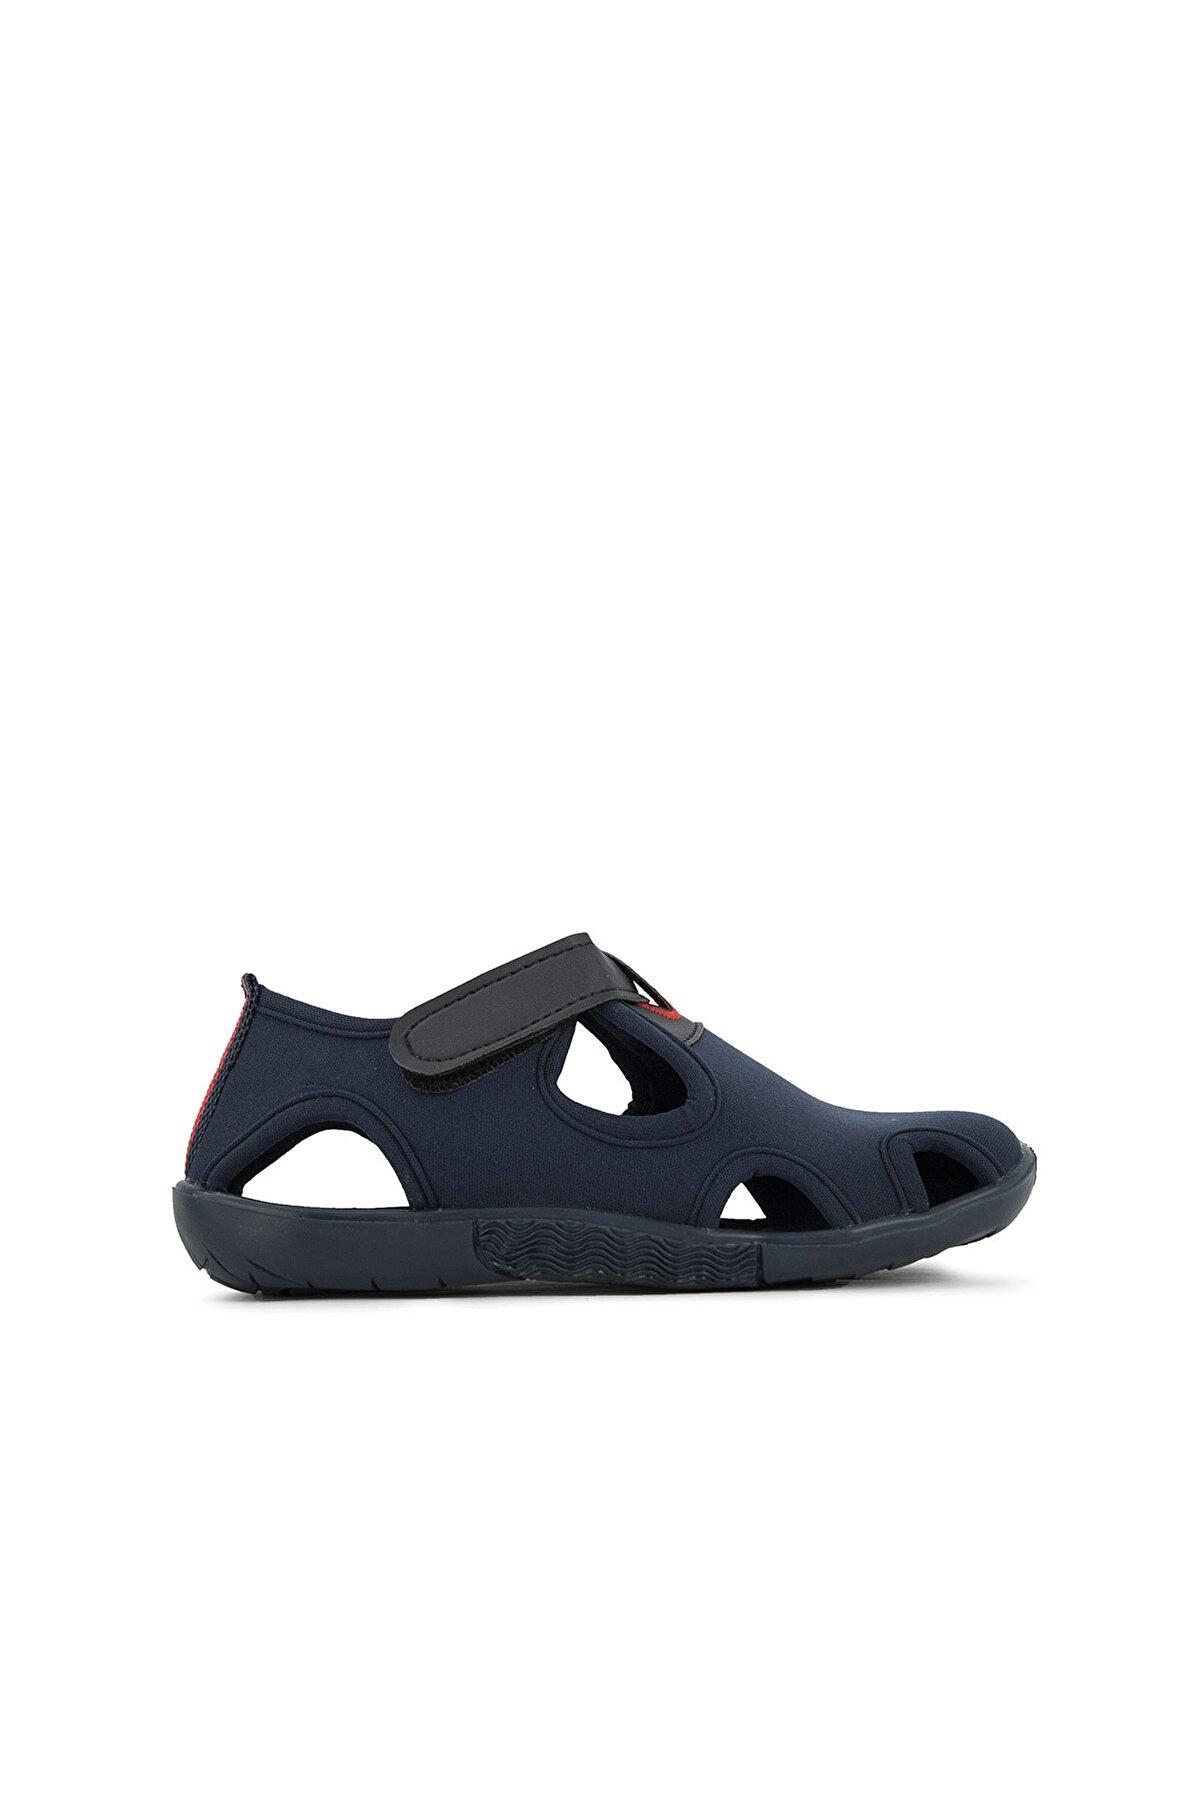 Slazenger Unnı Çocuk Sandalet Lacivert Sa11lp070